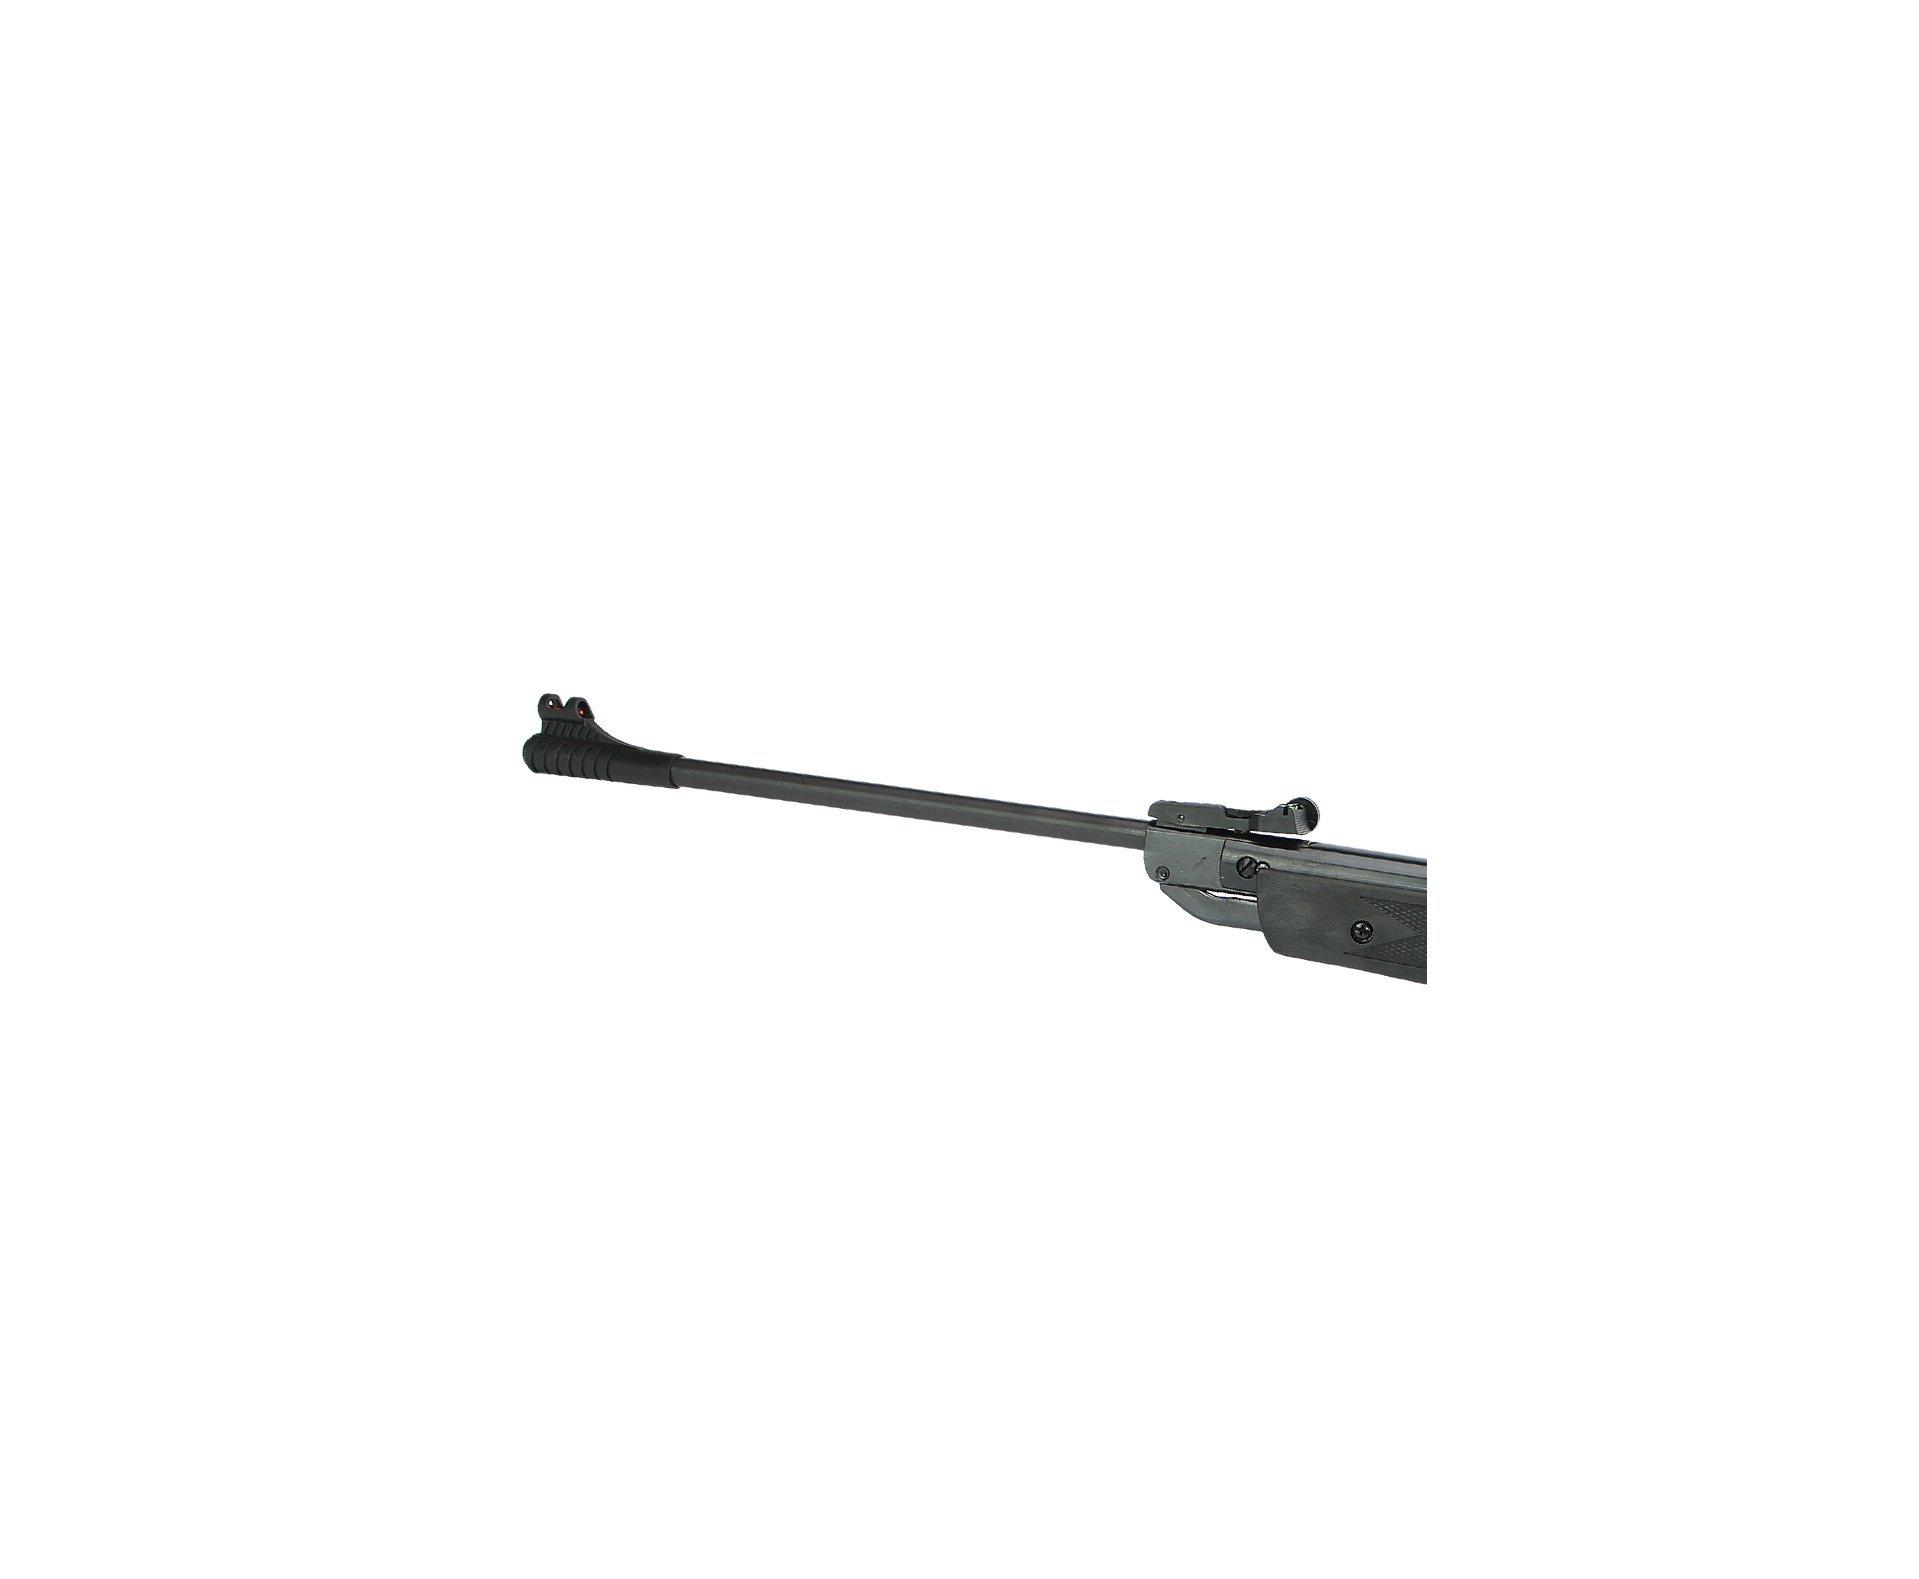 Carabina De Pressão Qgk 14 Black Edition 5,5mm